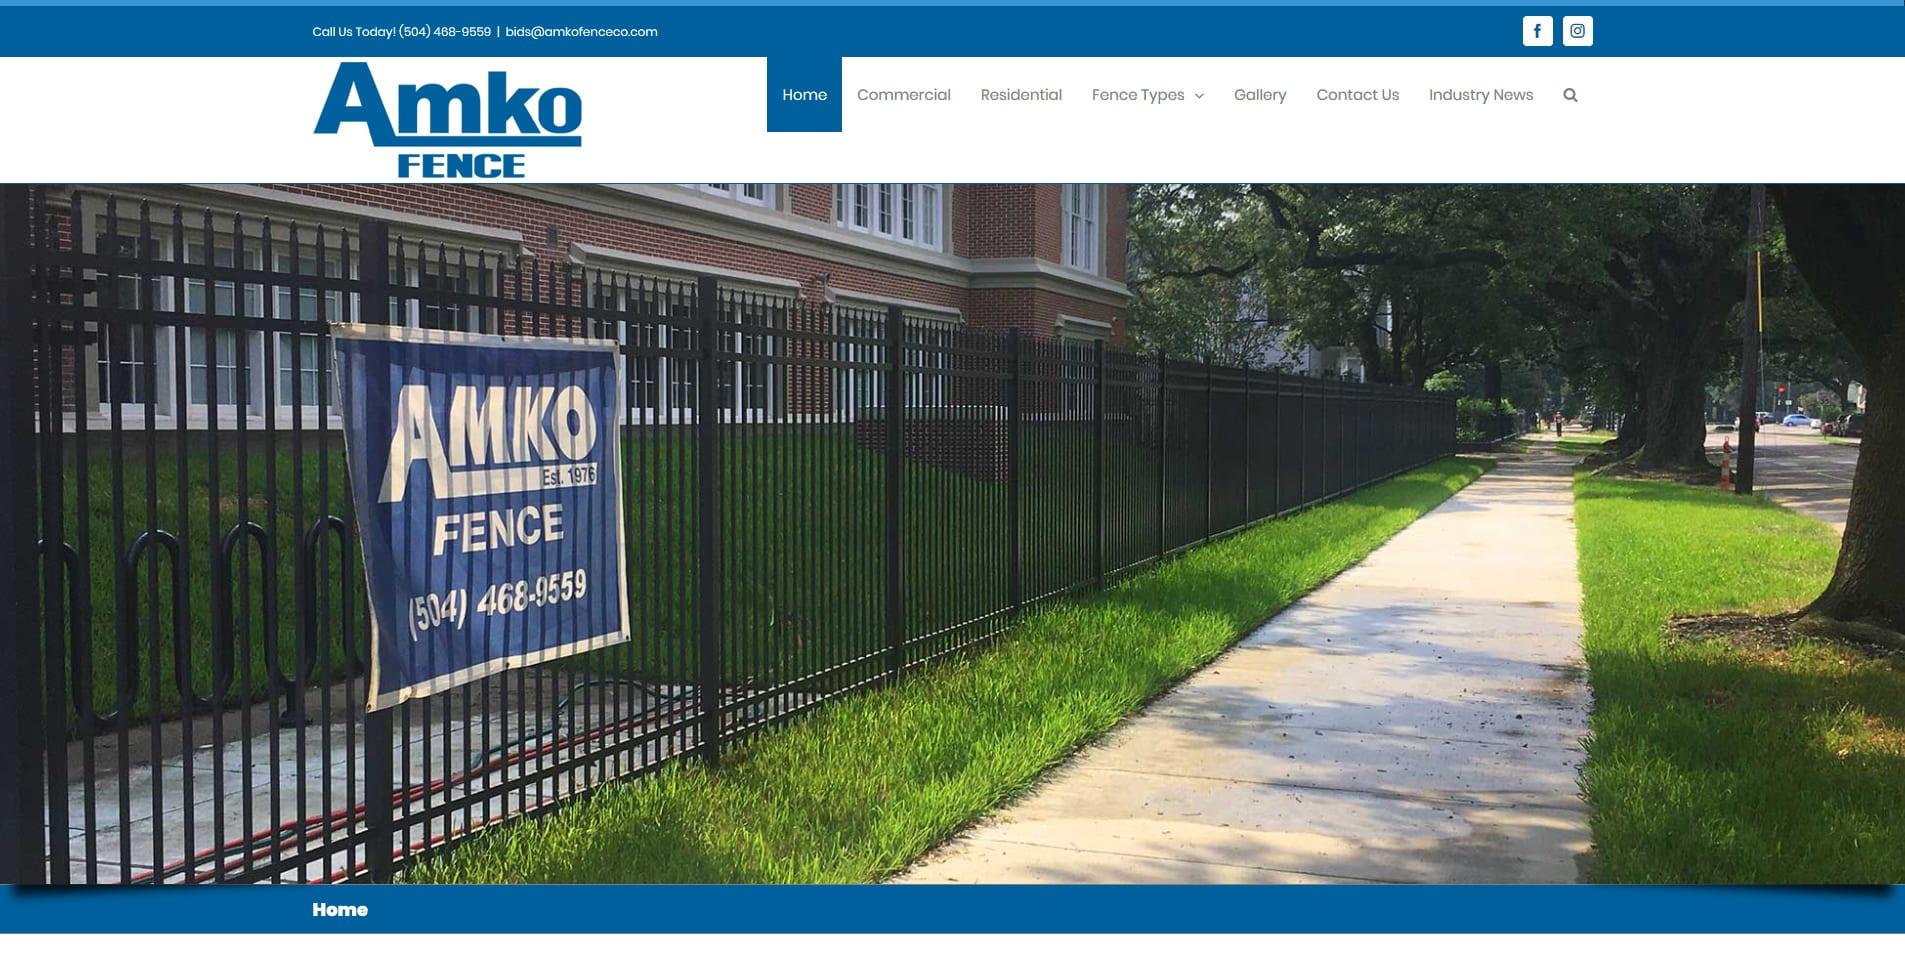 Amko Fence Company